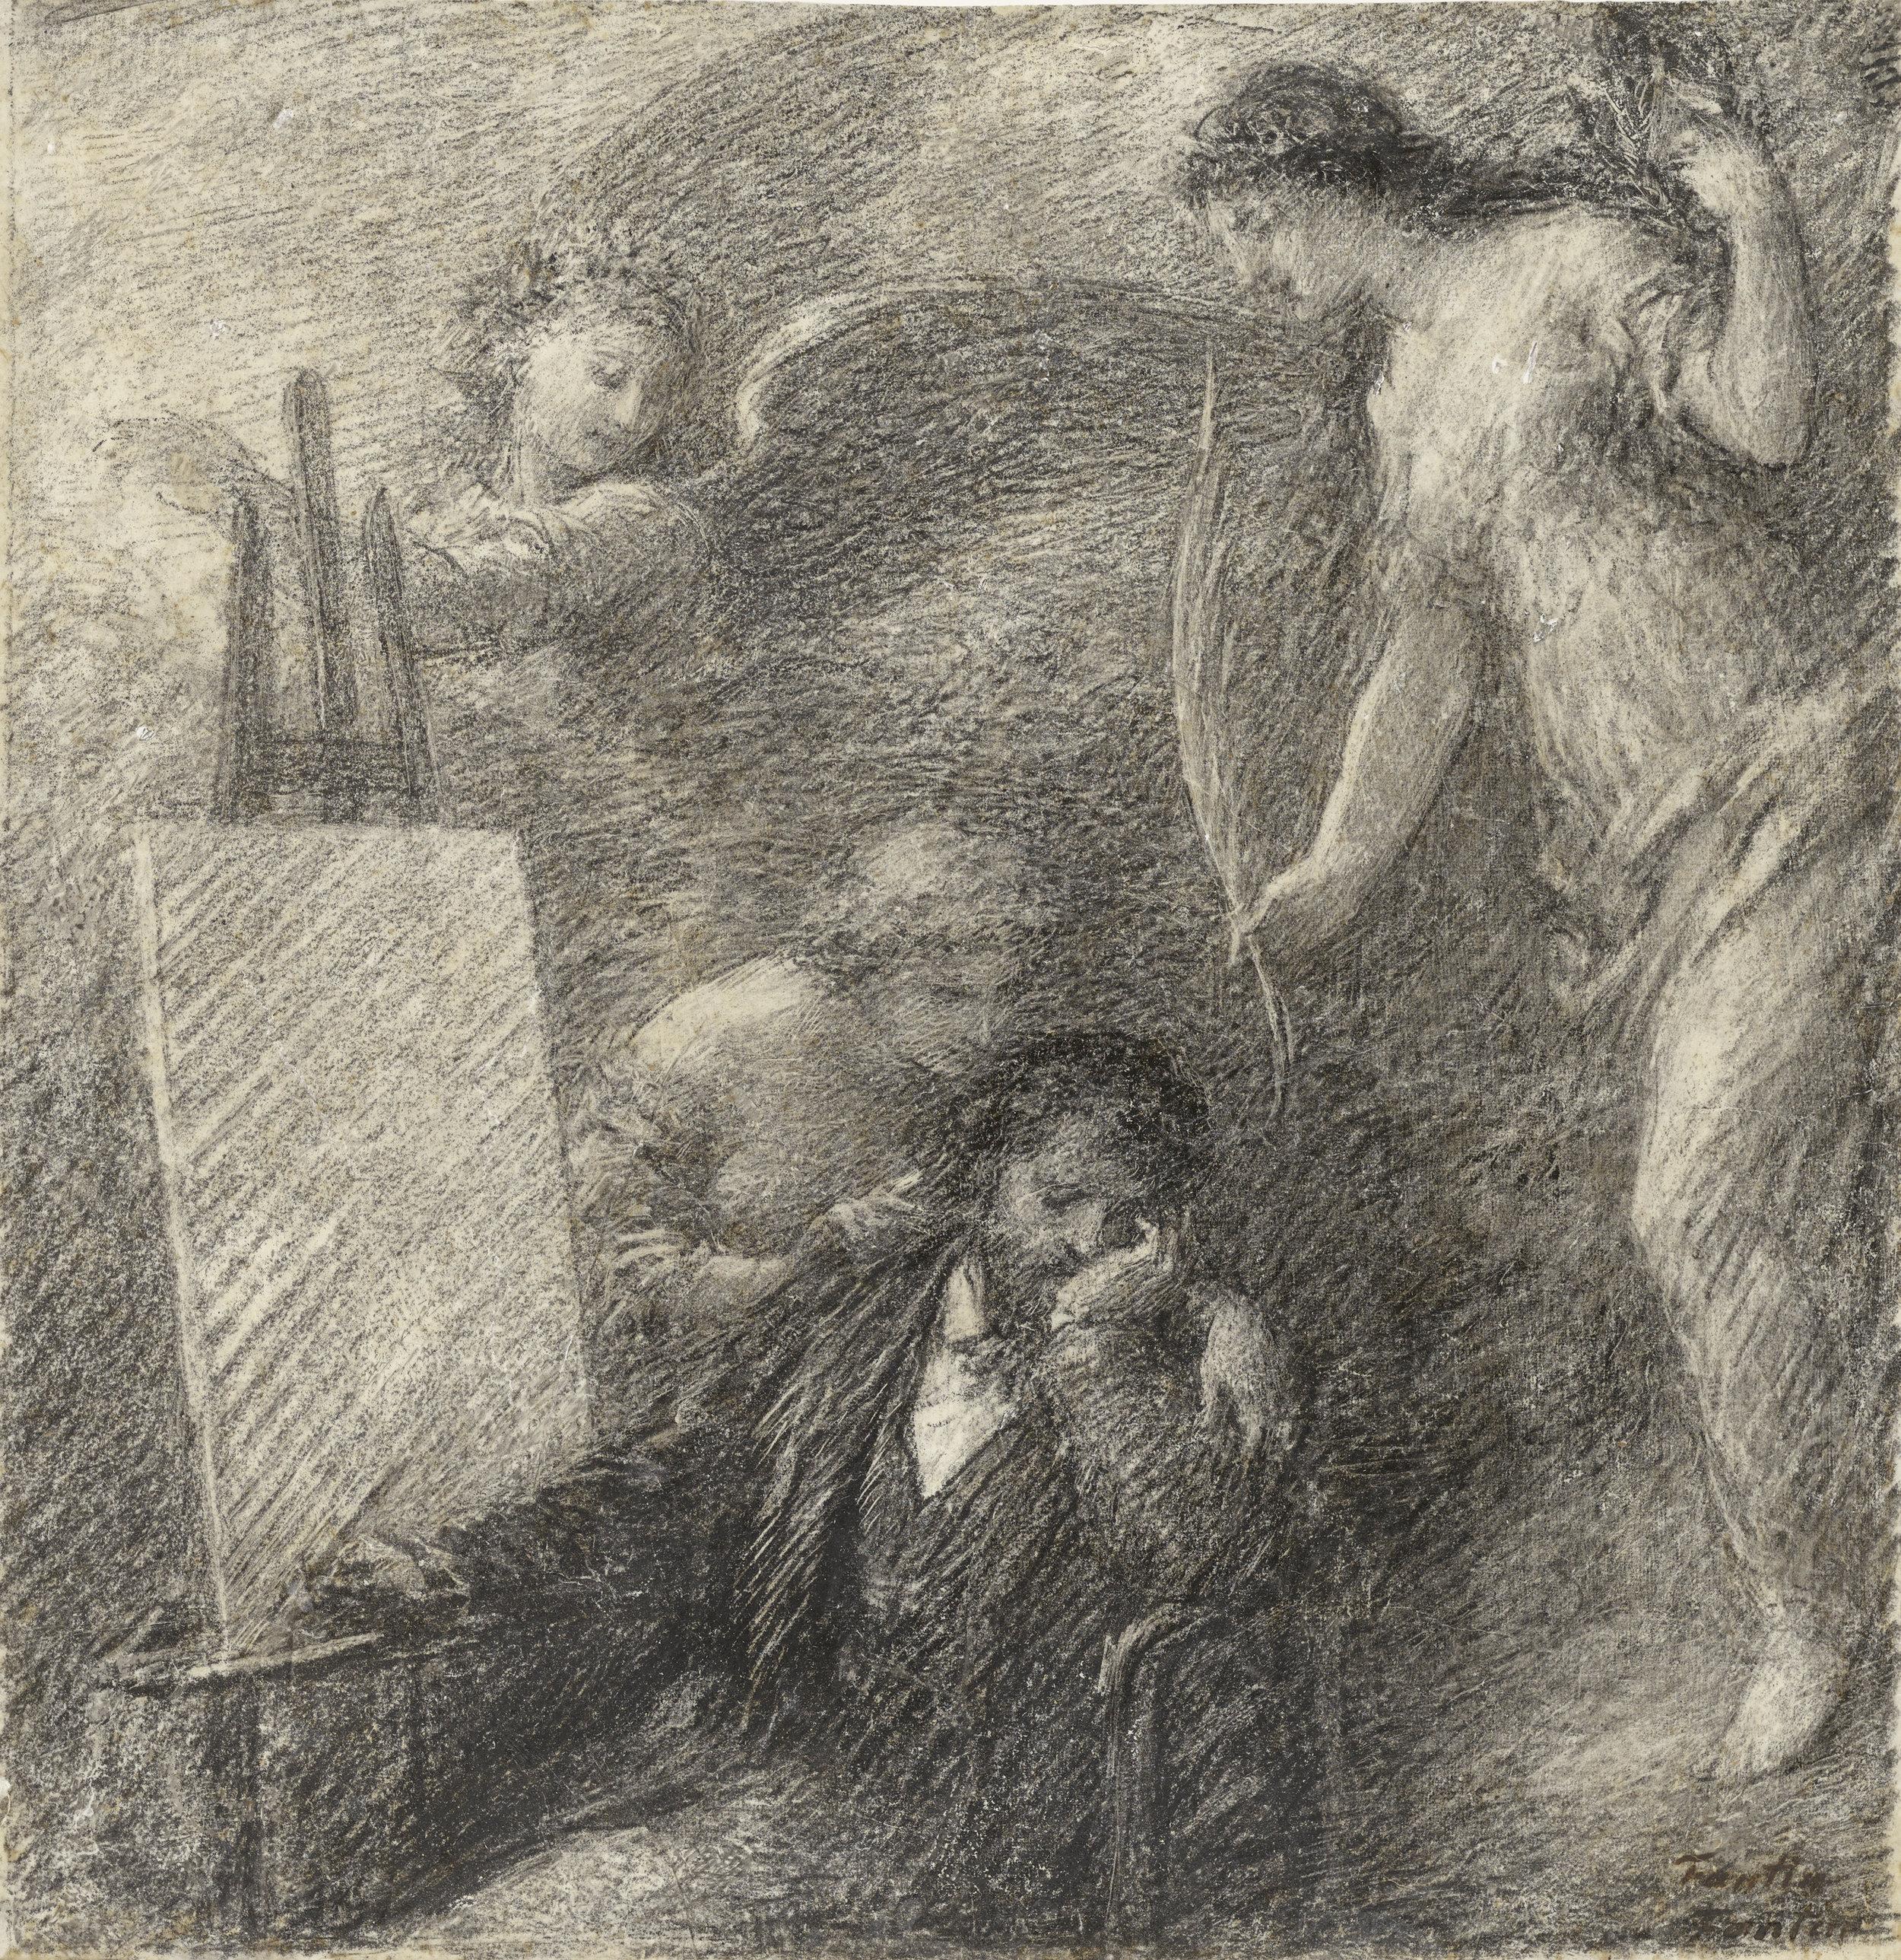 The discouraged Artist by fantin latour (A self portrait)